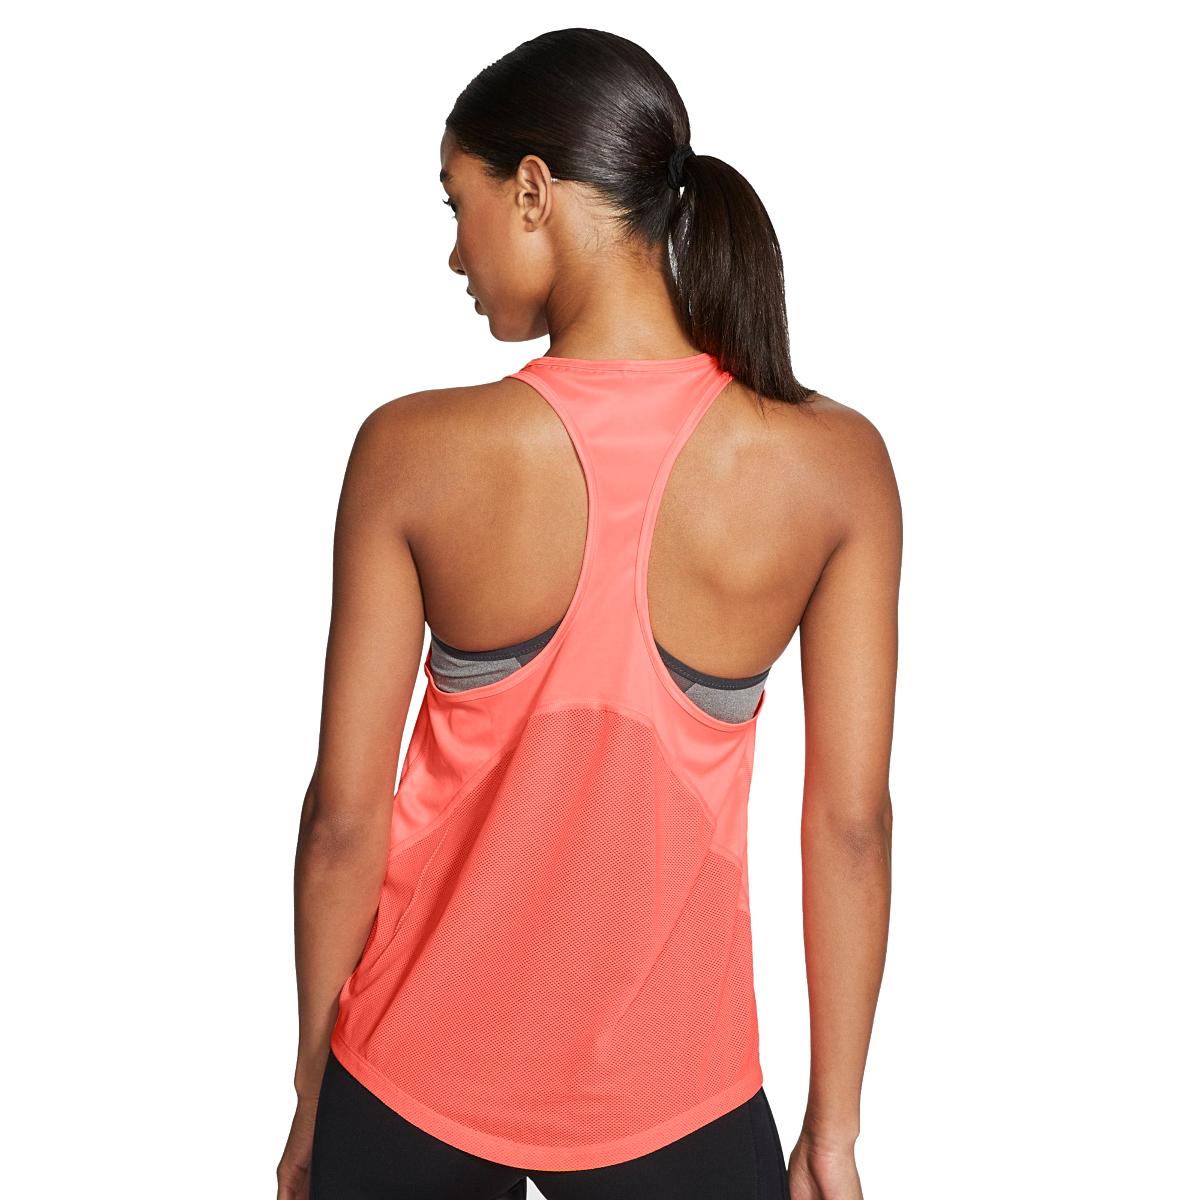 Women's Nike Miler Women's Running Singlet - Color: Bright Mango/Reflective - Size: L, Bright Mango/Reflective, large, image 4